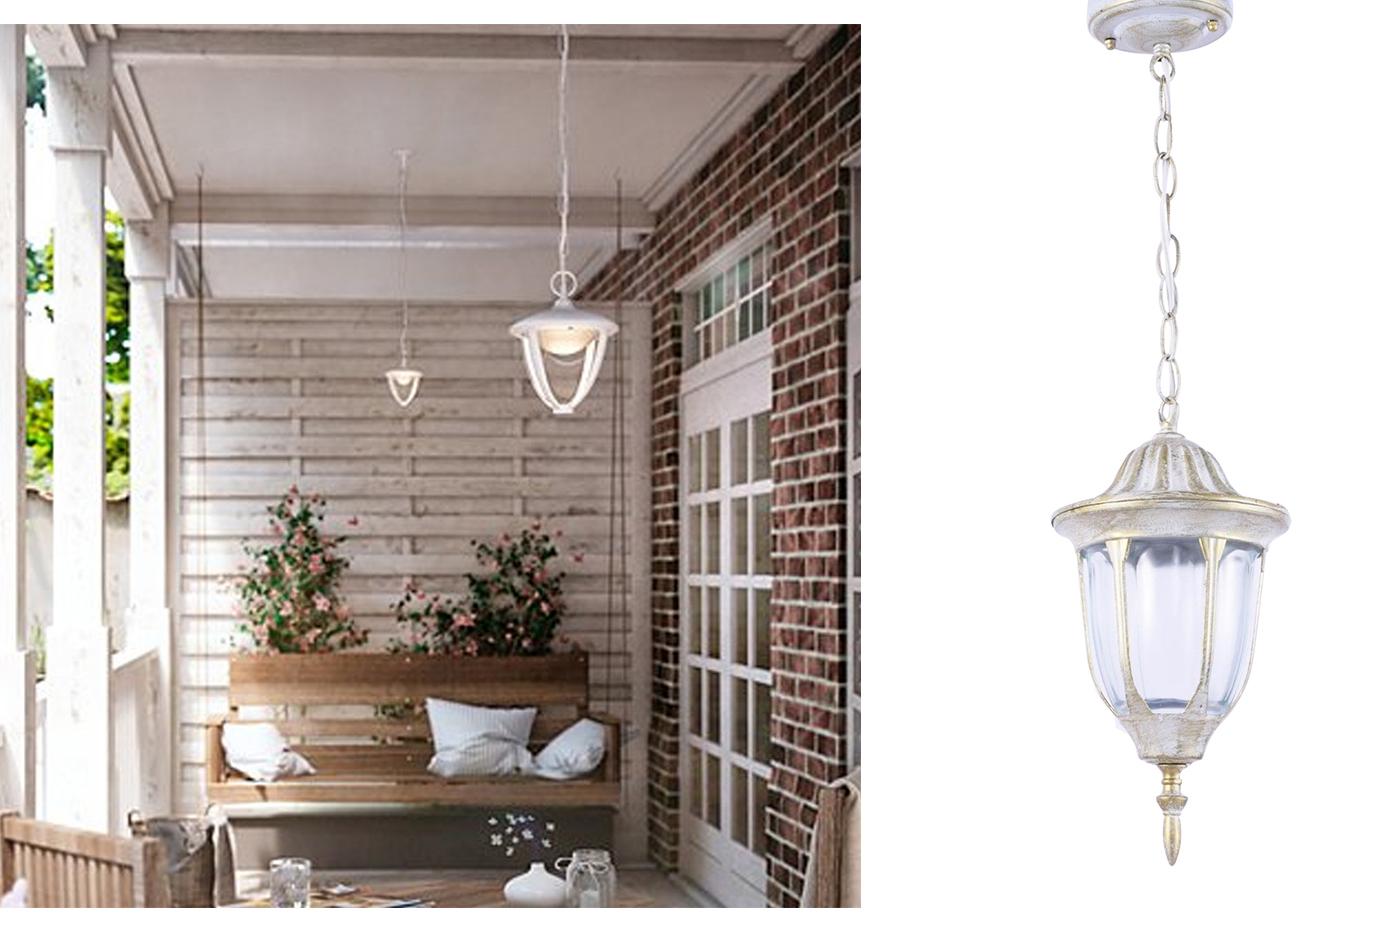 Lampade A Sospensione Vintage : Bes 24926 lampadari beselettronica lanterna a sospensione